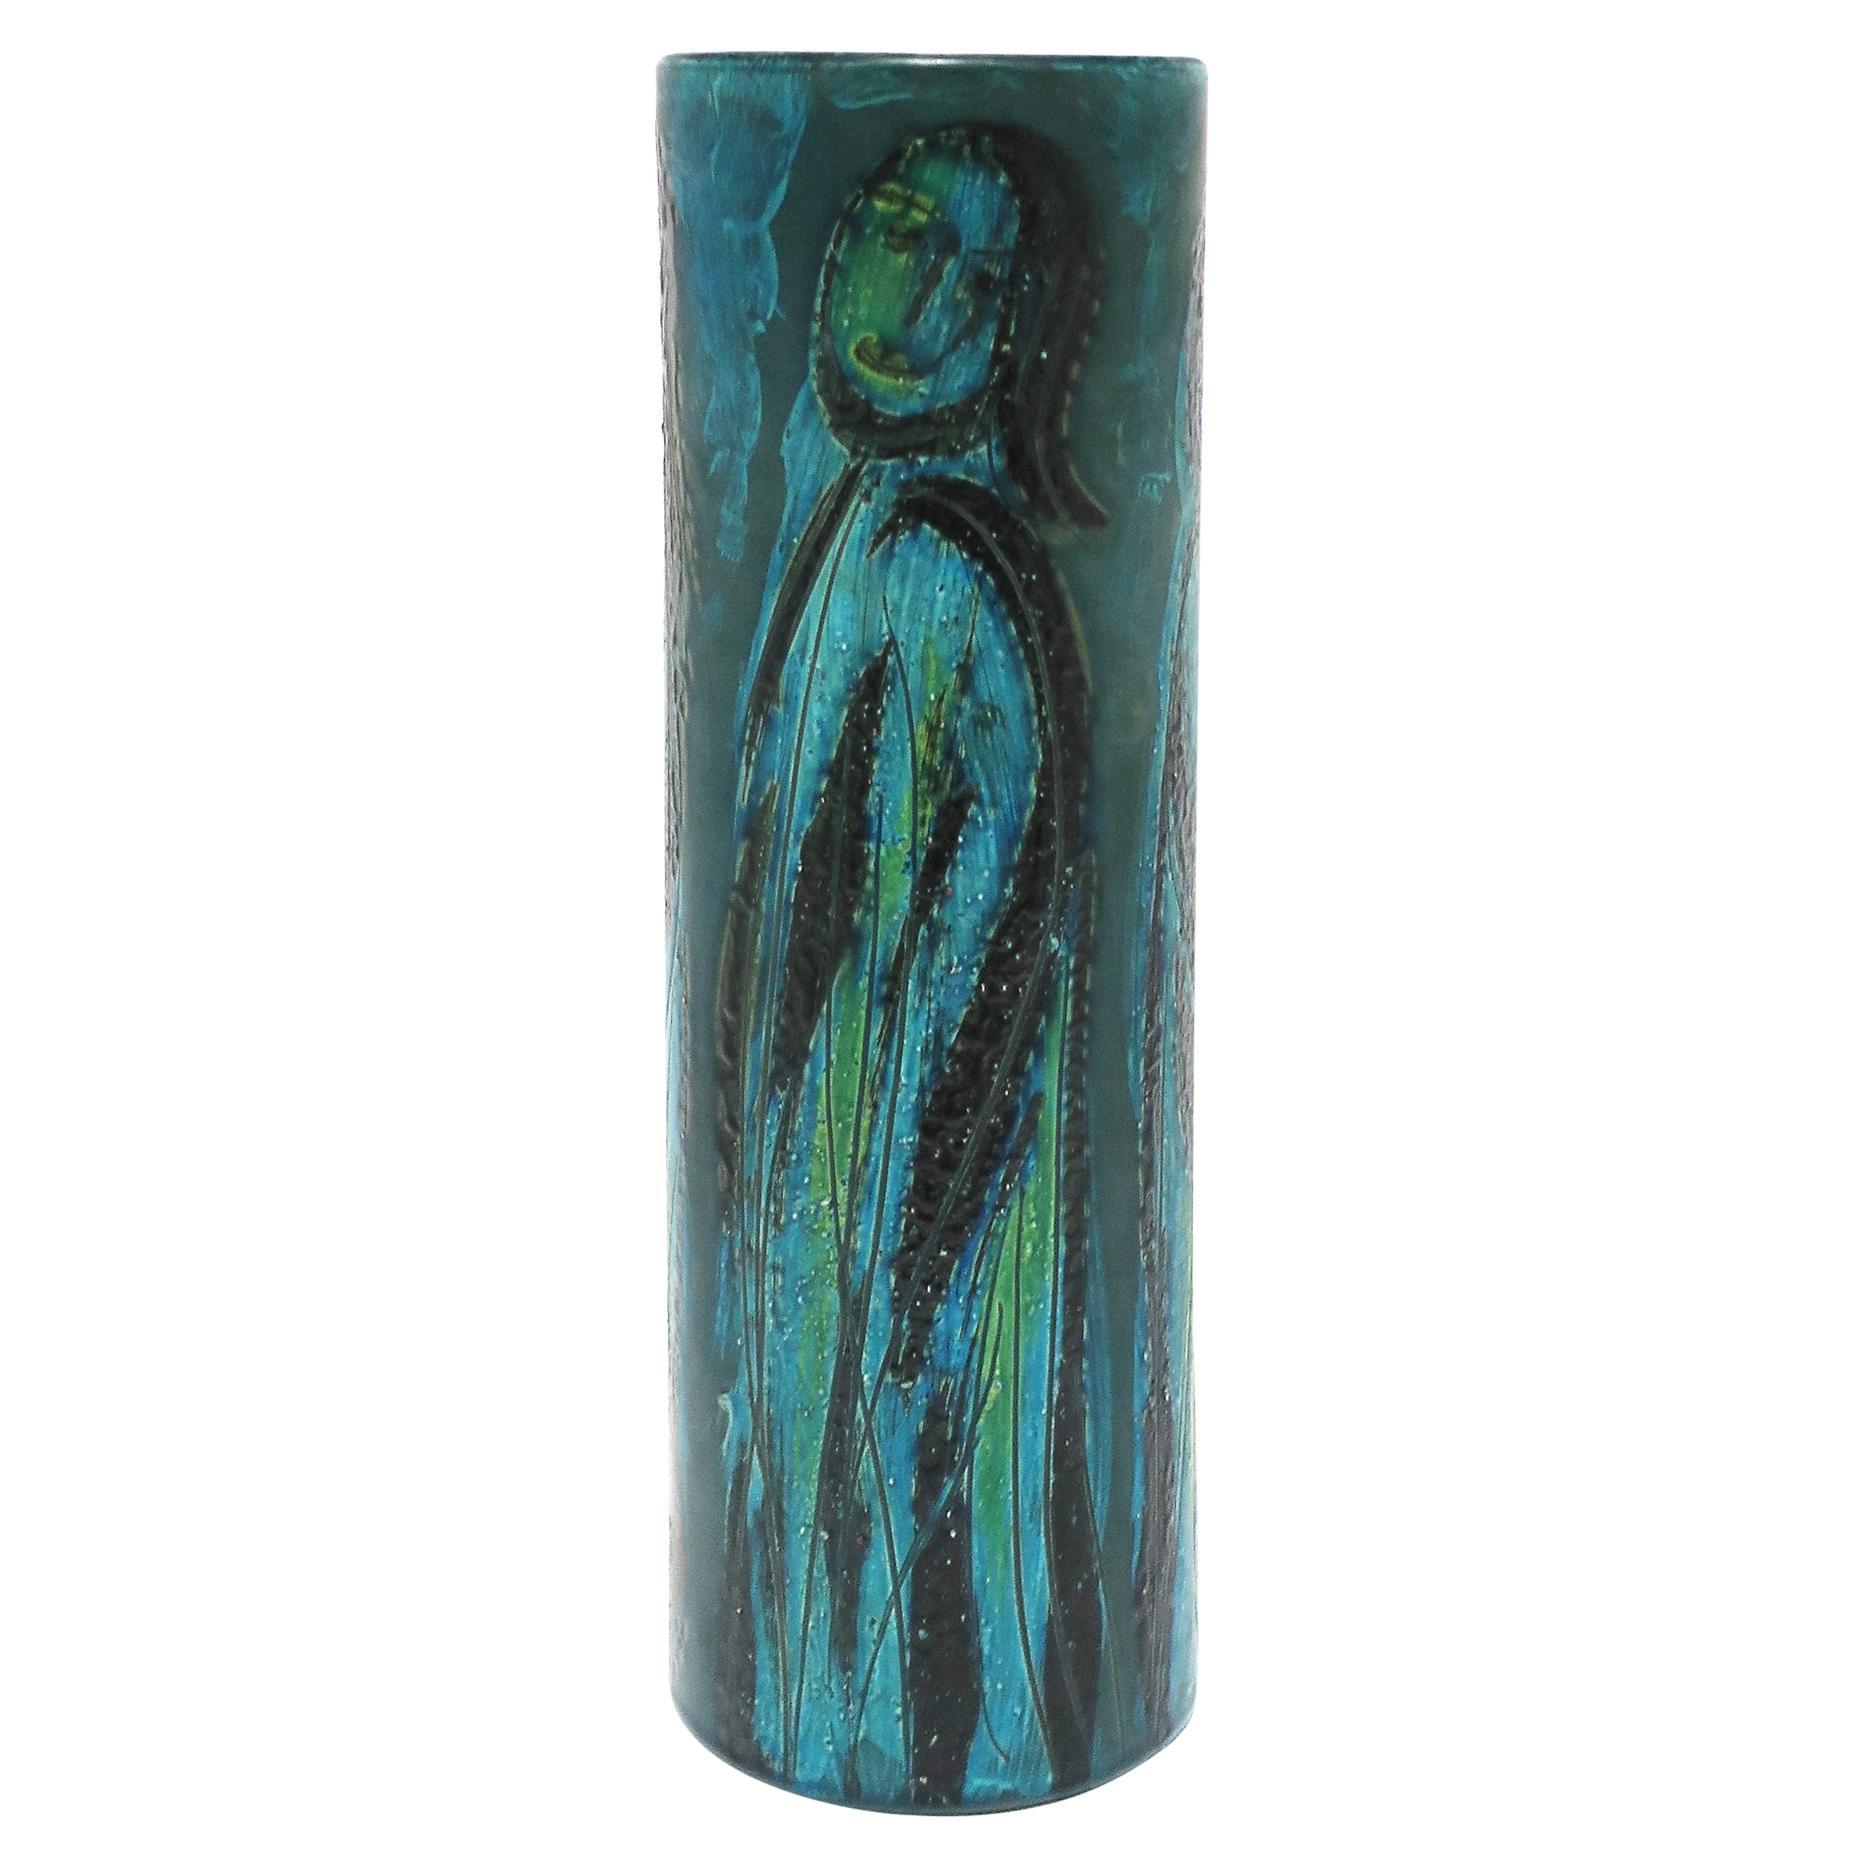 Italian Blue Pottery Vase with Figurative Design, circa 20th Century